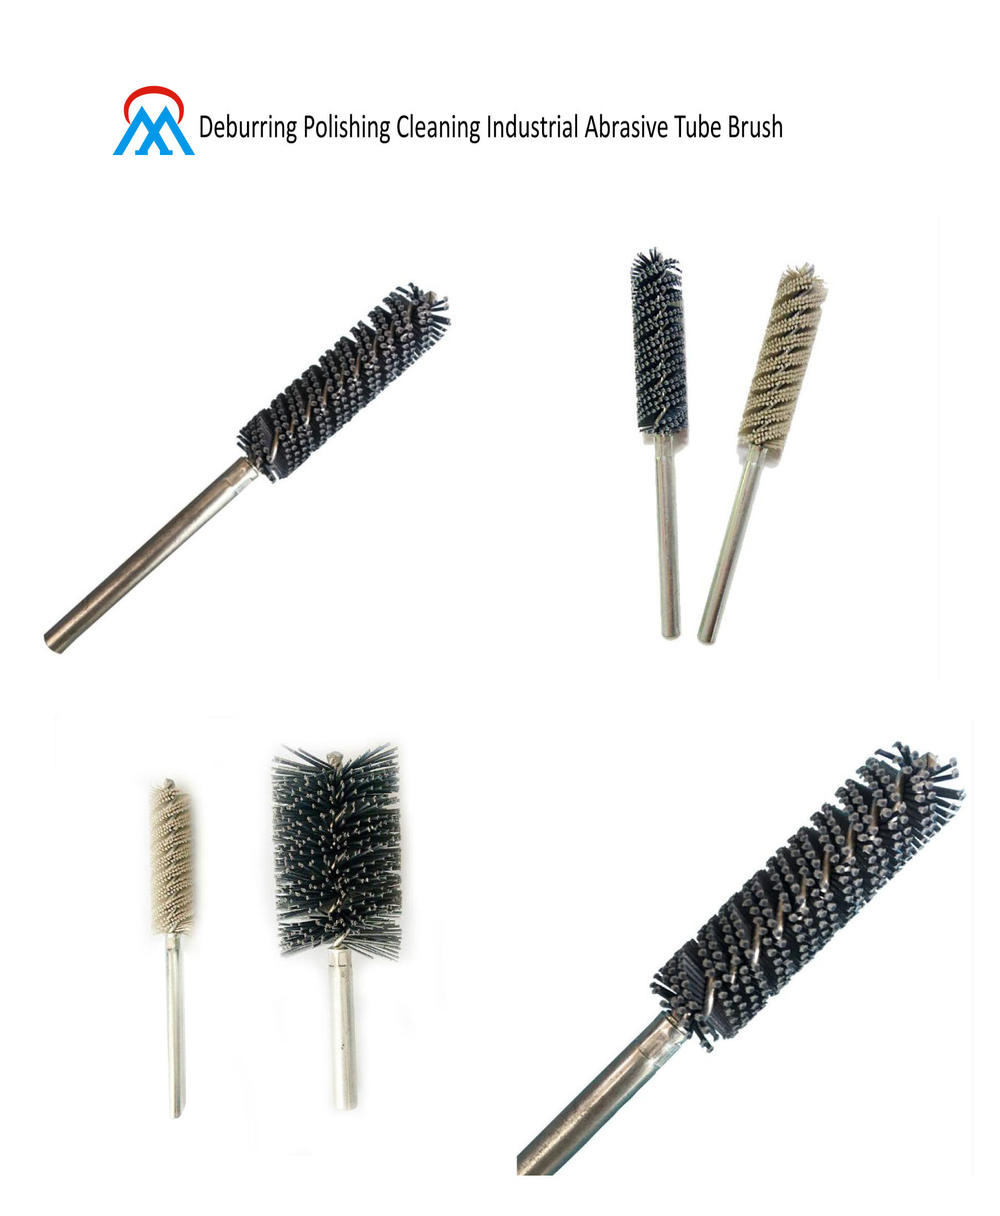 Deburring Polishing Cleaning Industrial Abrasive Tube Brush